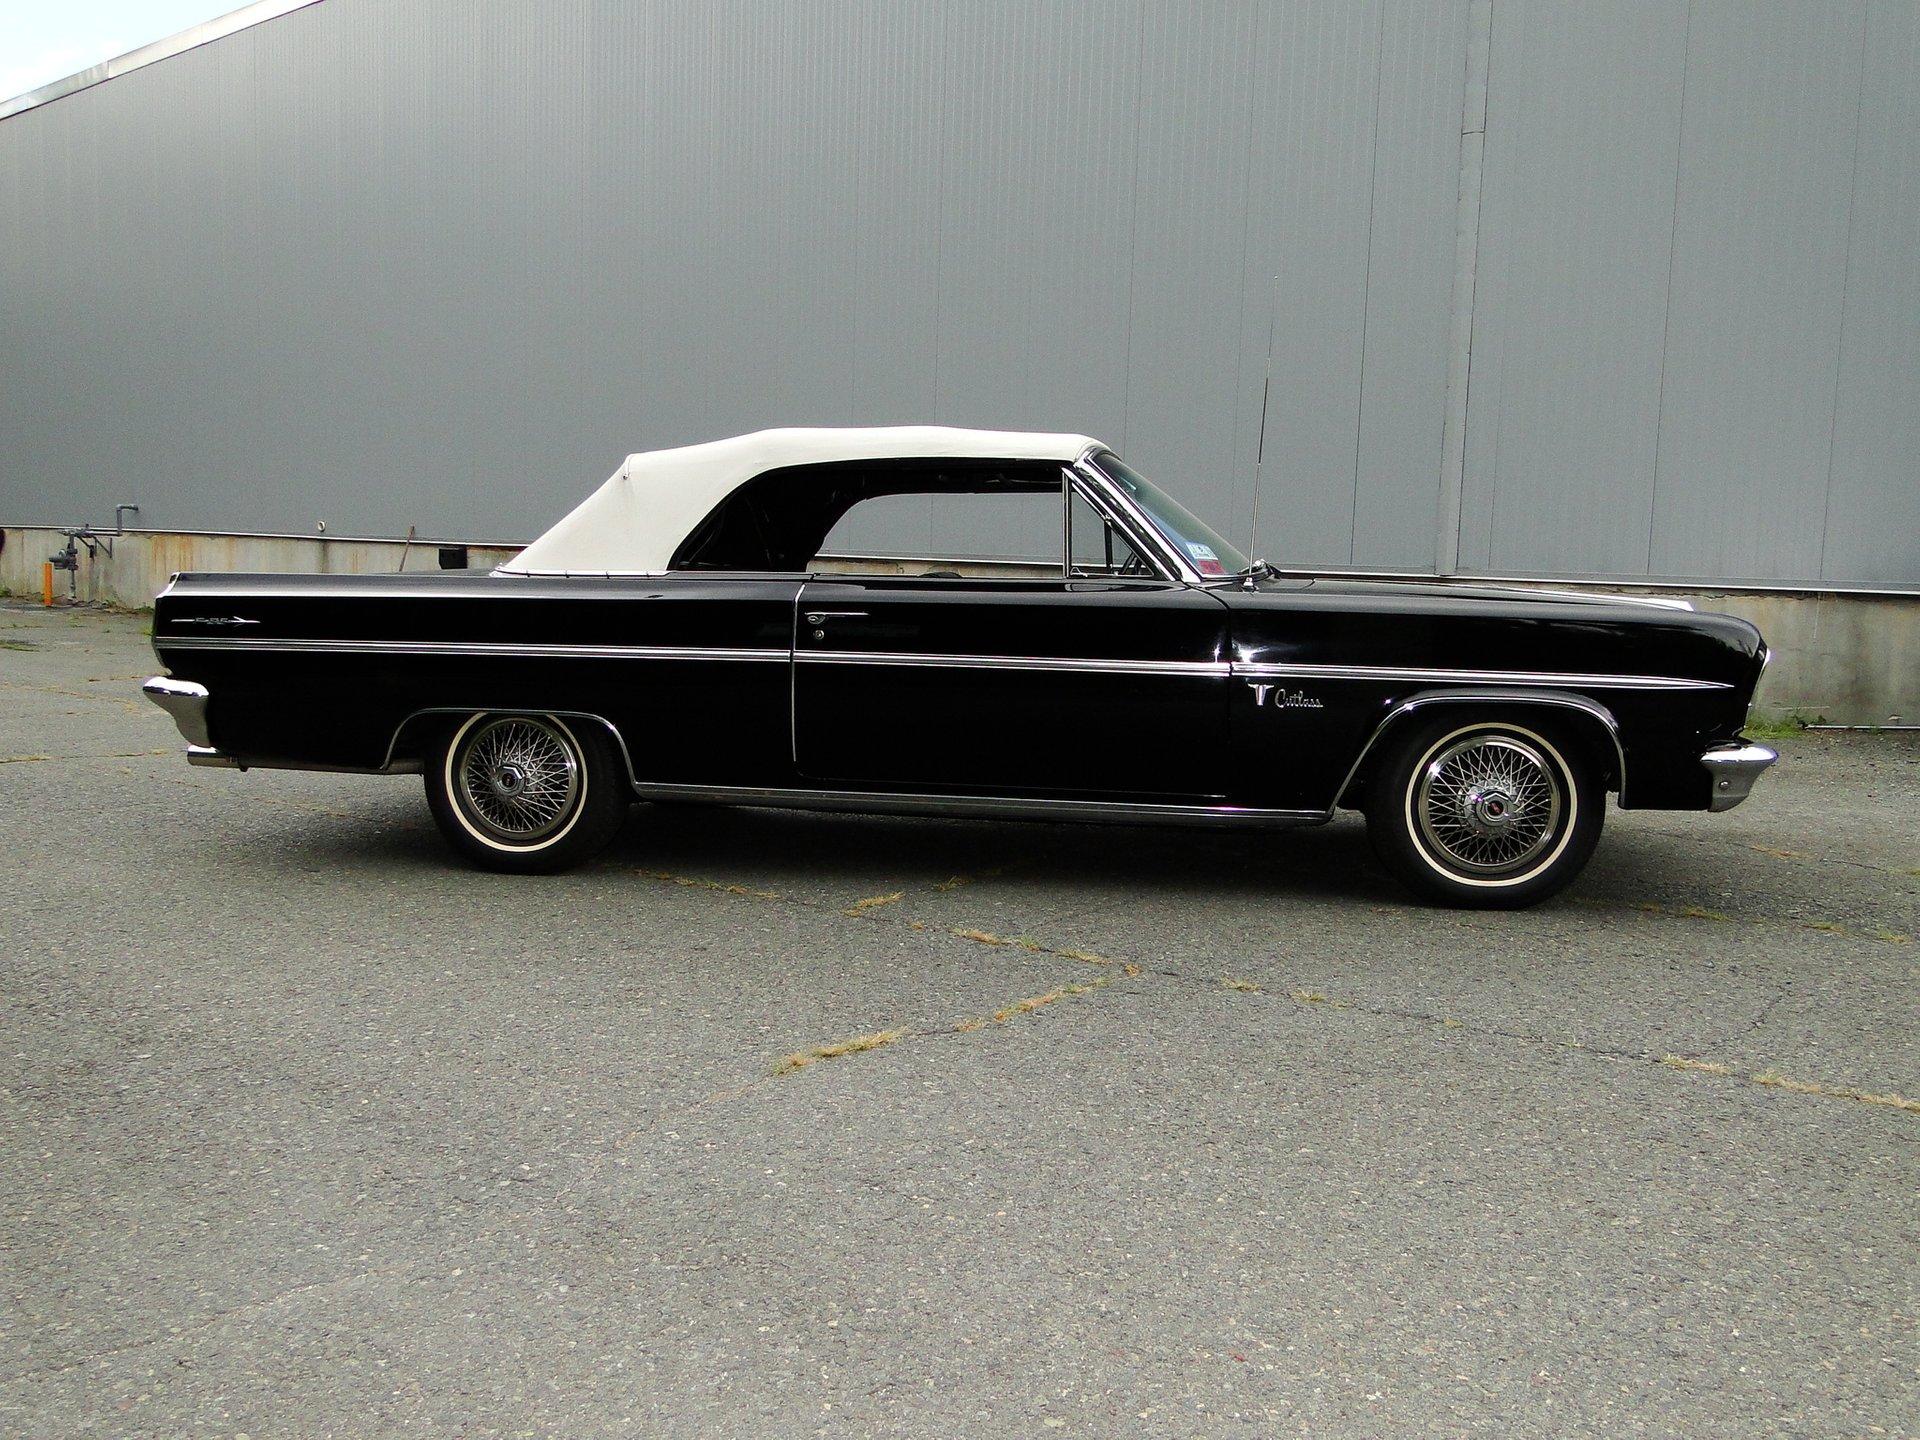 1963 Oldsmobile F85 | Legendary Motors - Classic Cars, Muscle Cars